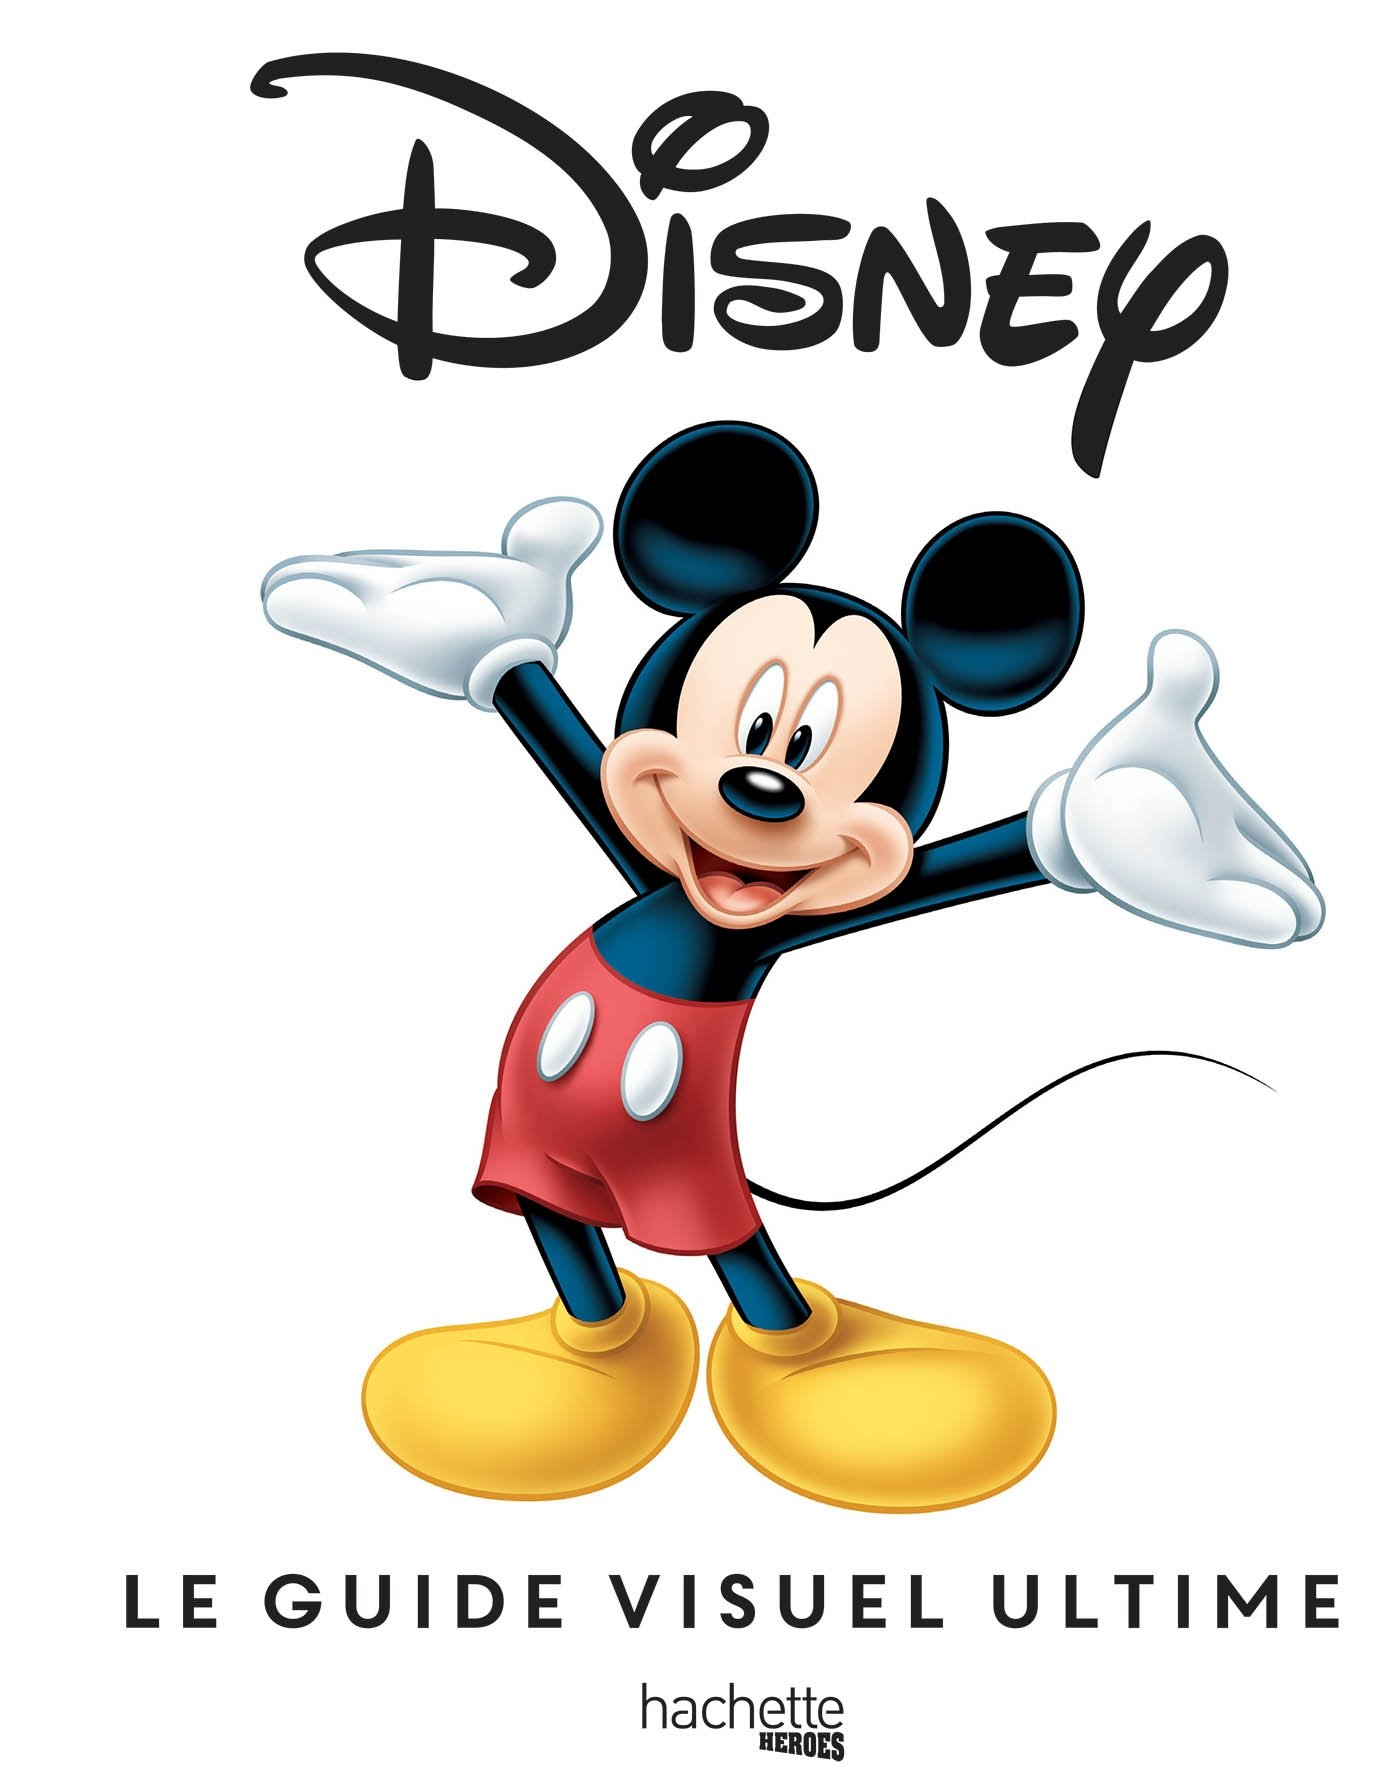 Xmas Disney Wishlist  71Nuym3hlhL